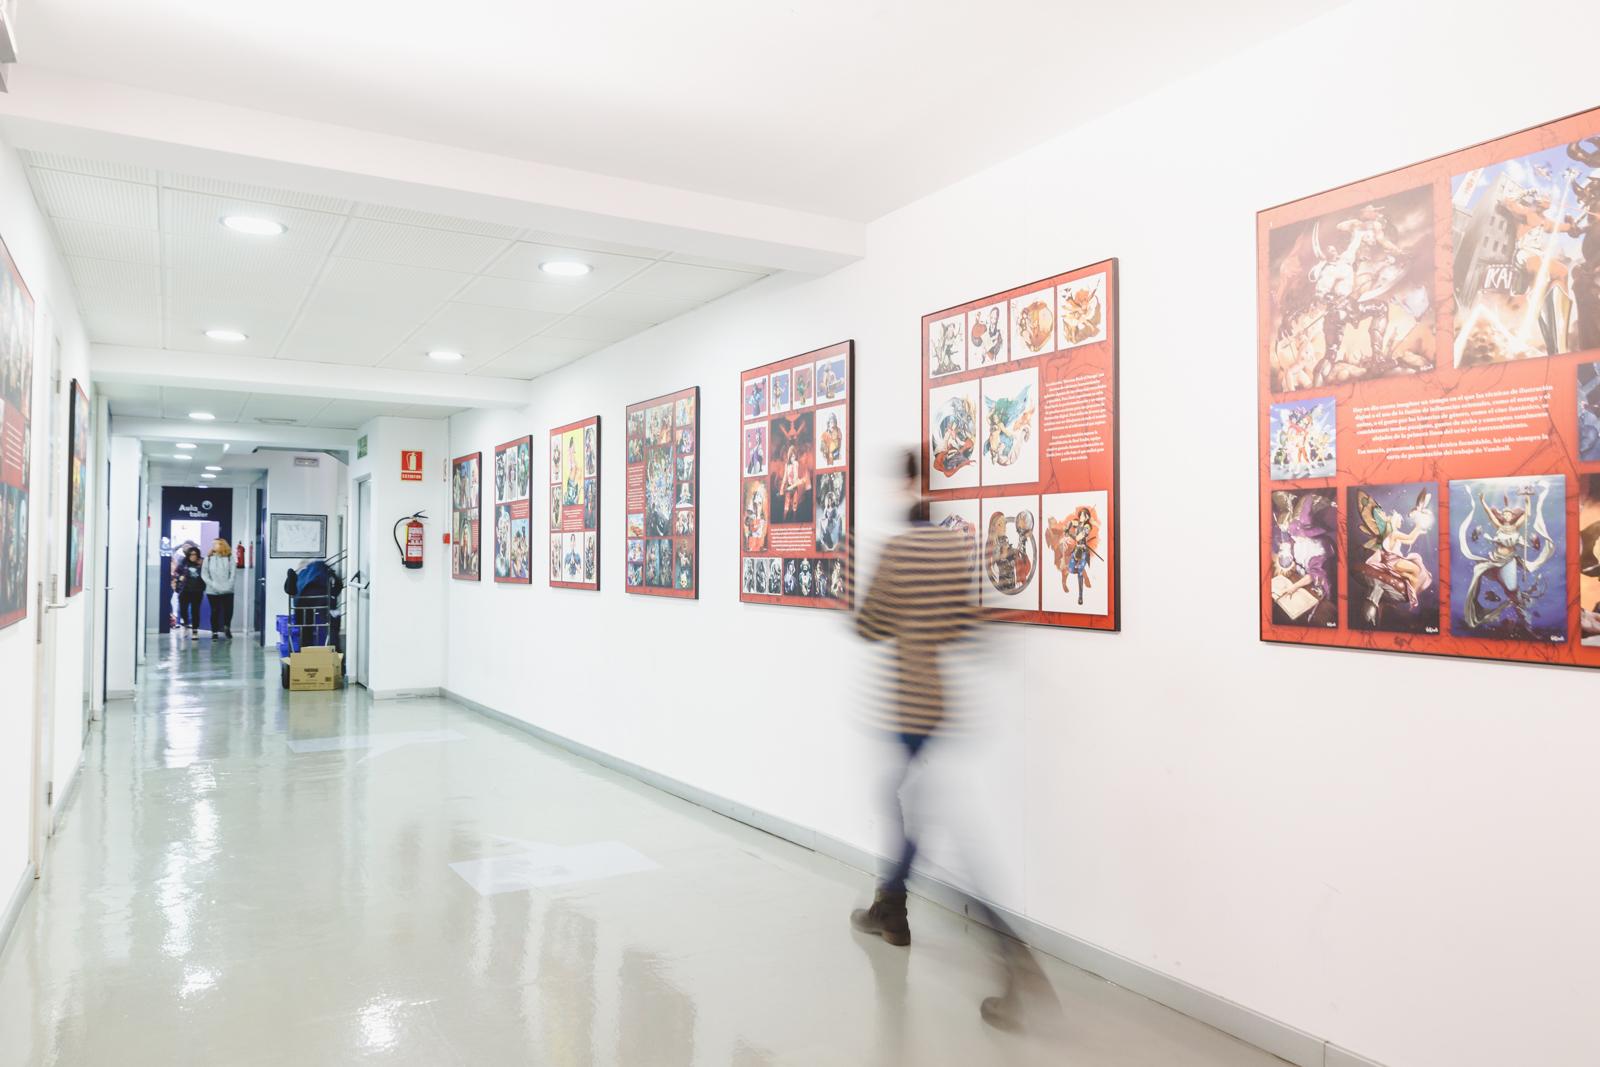 escuela-de-comic-joso-barcelona-fotografia-corporativa-misshappyflash-51.jpg